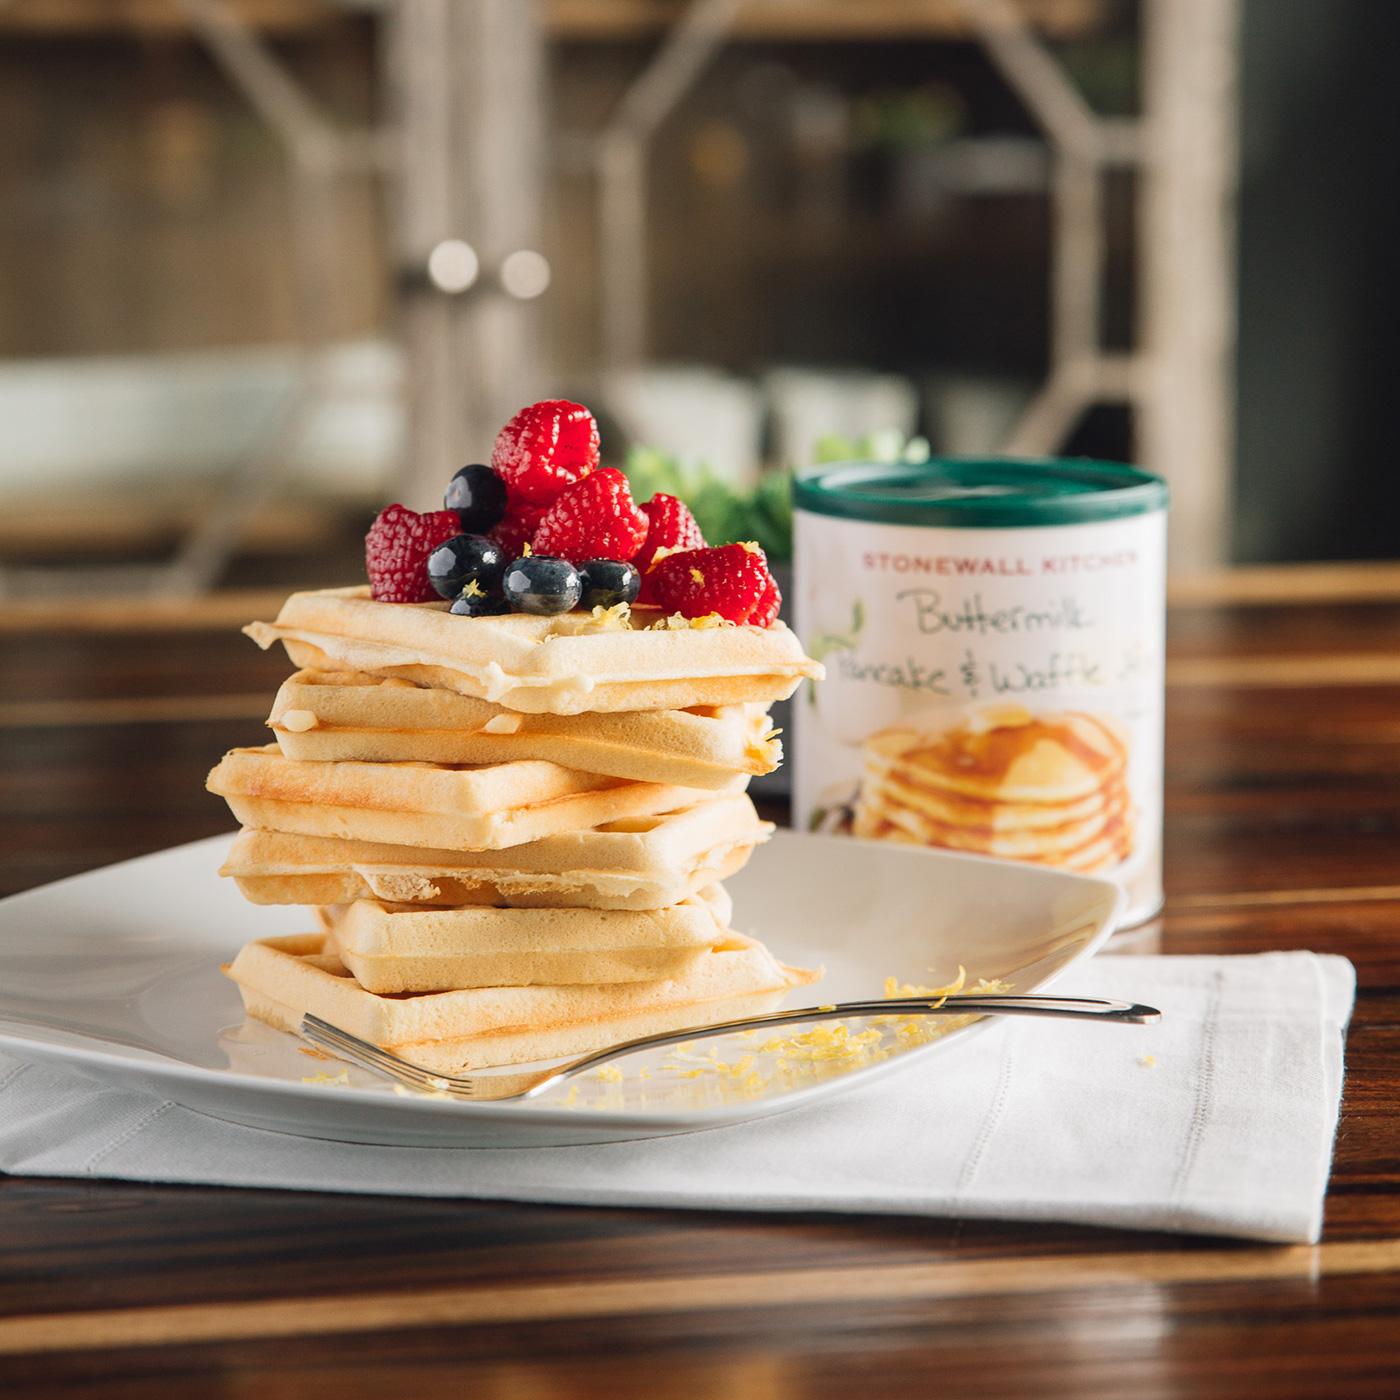 stonewall kitchen pancake mix table set with bench buttermilk & waffle | pancakes syrups ...